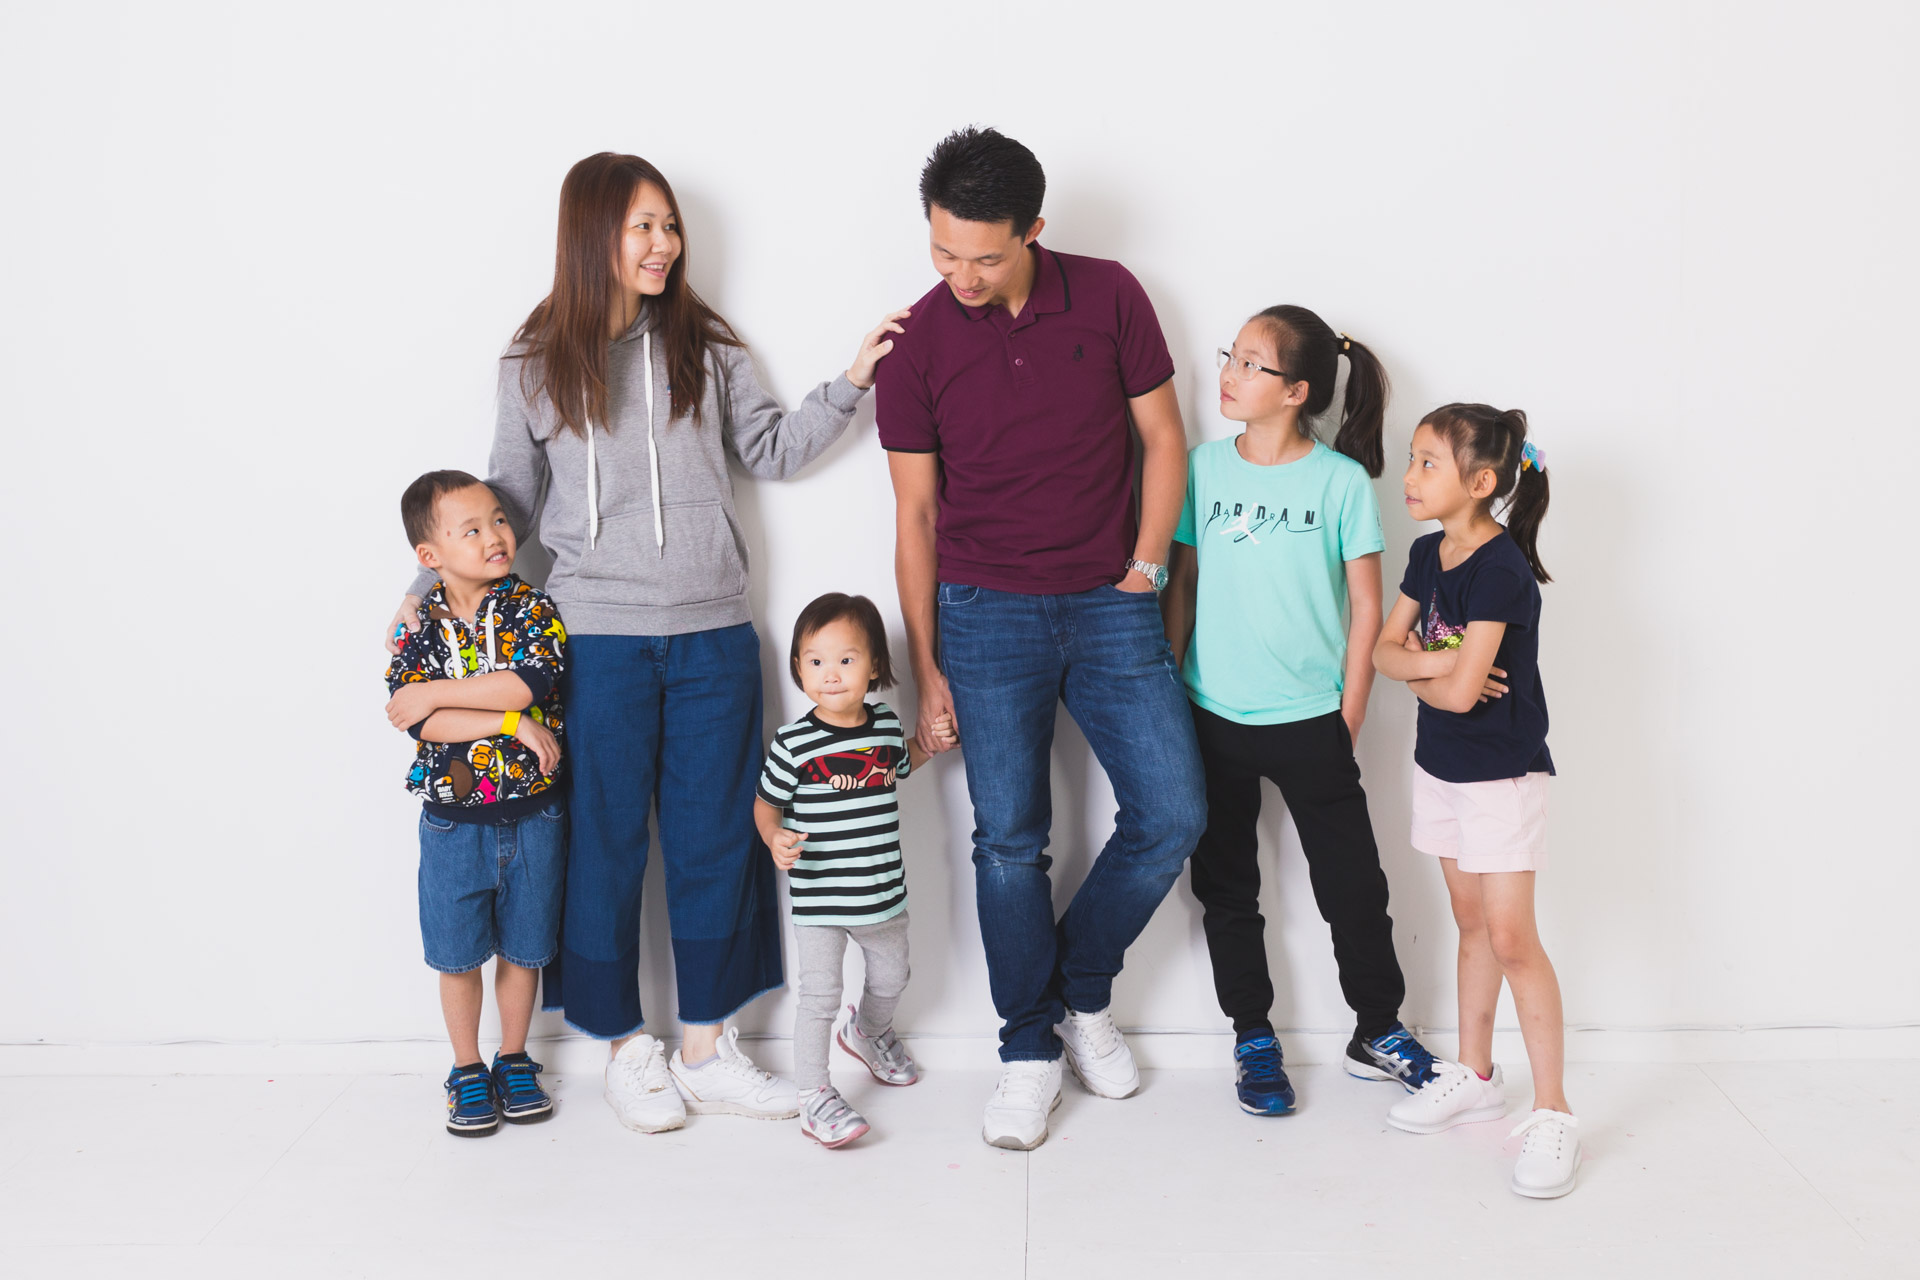 Children Family Photography by Ricky Parker Photography 7